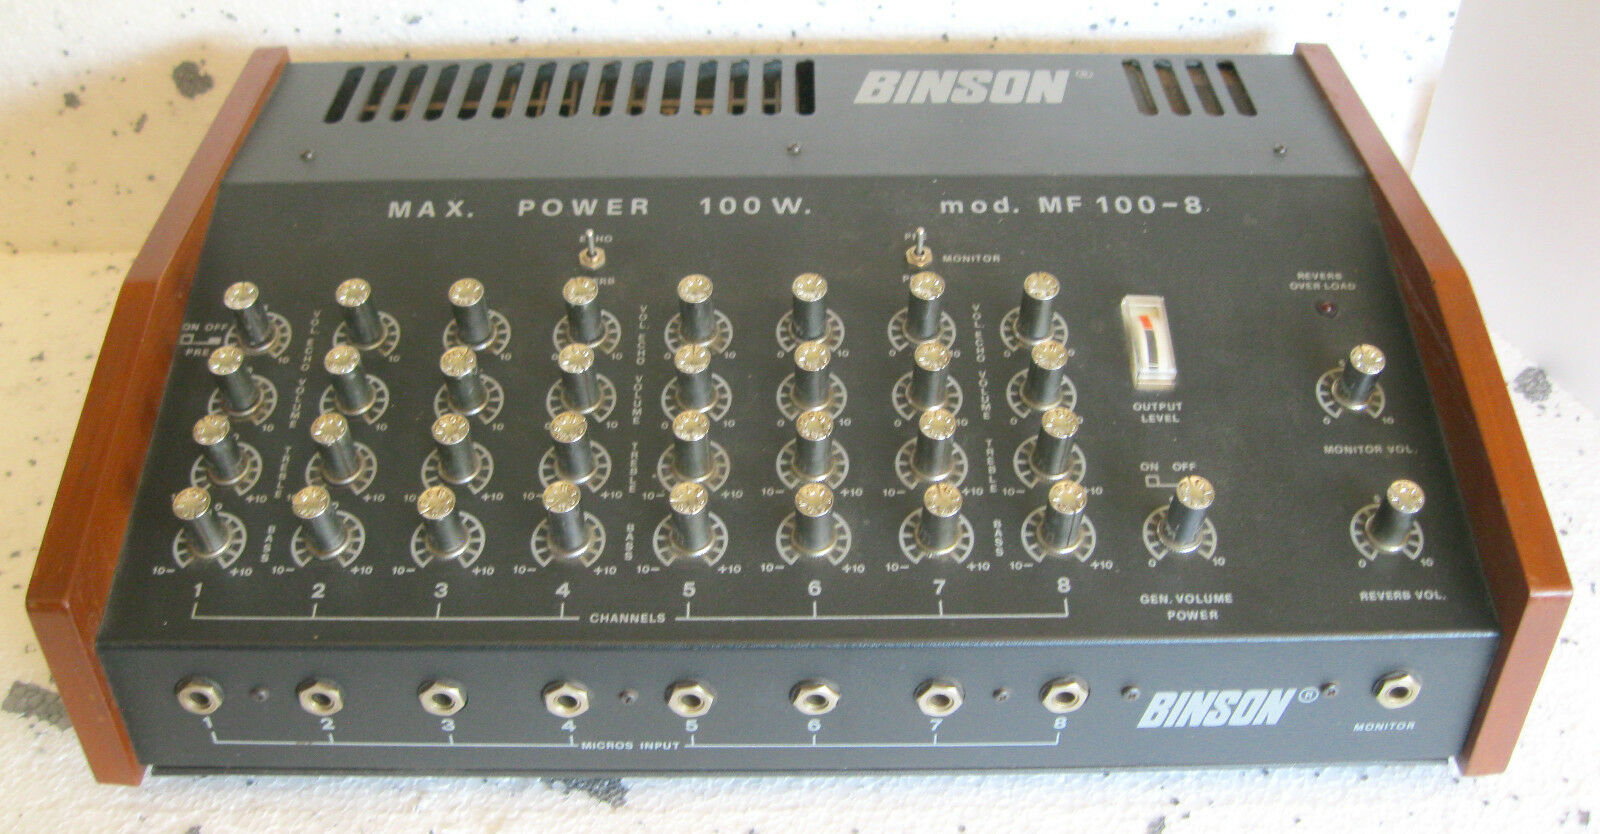 BINSON MF 100-8 (1978) 100-watt 8-channel mixer amplifier - VERY RARE